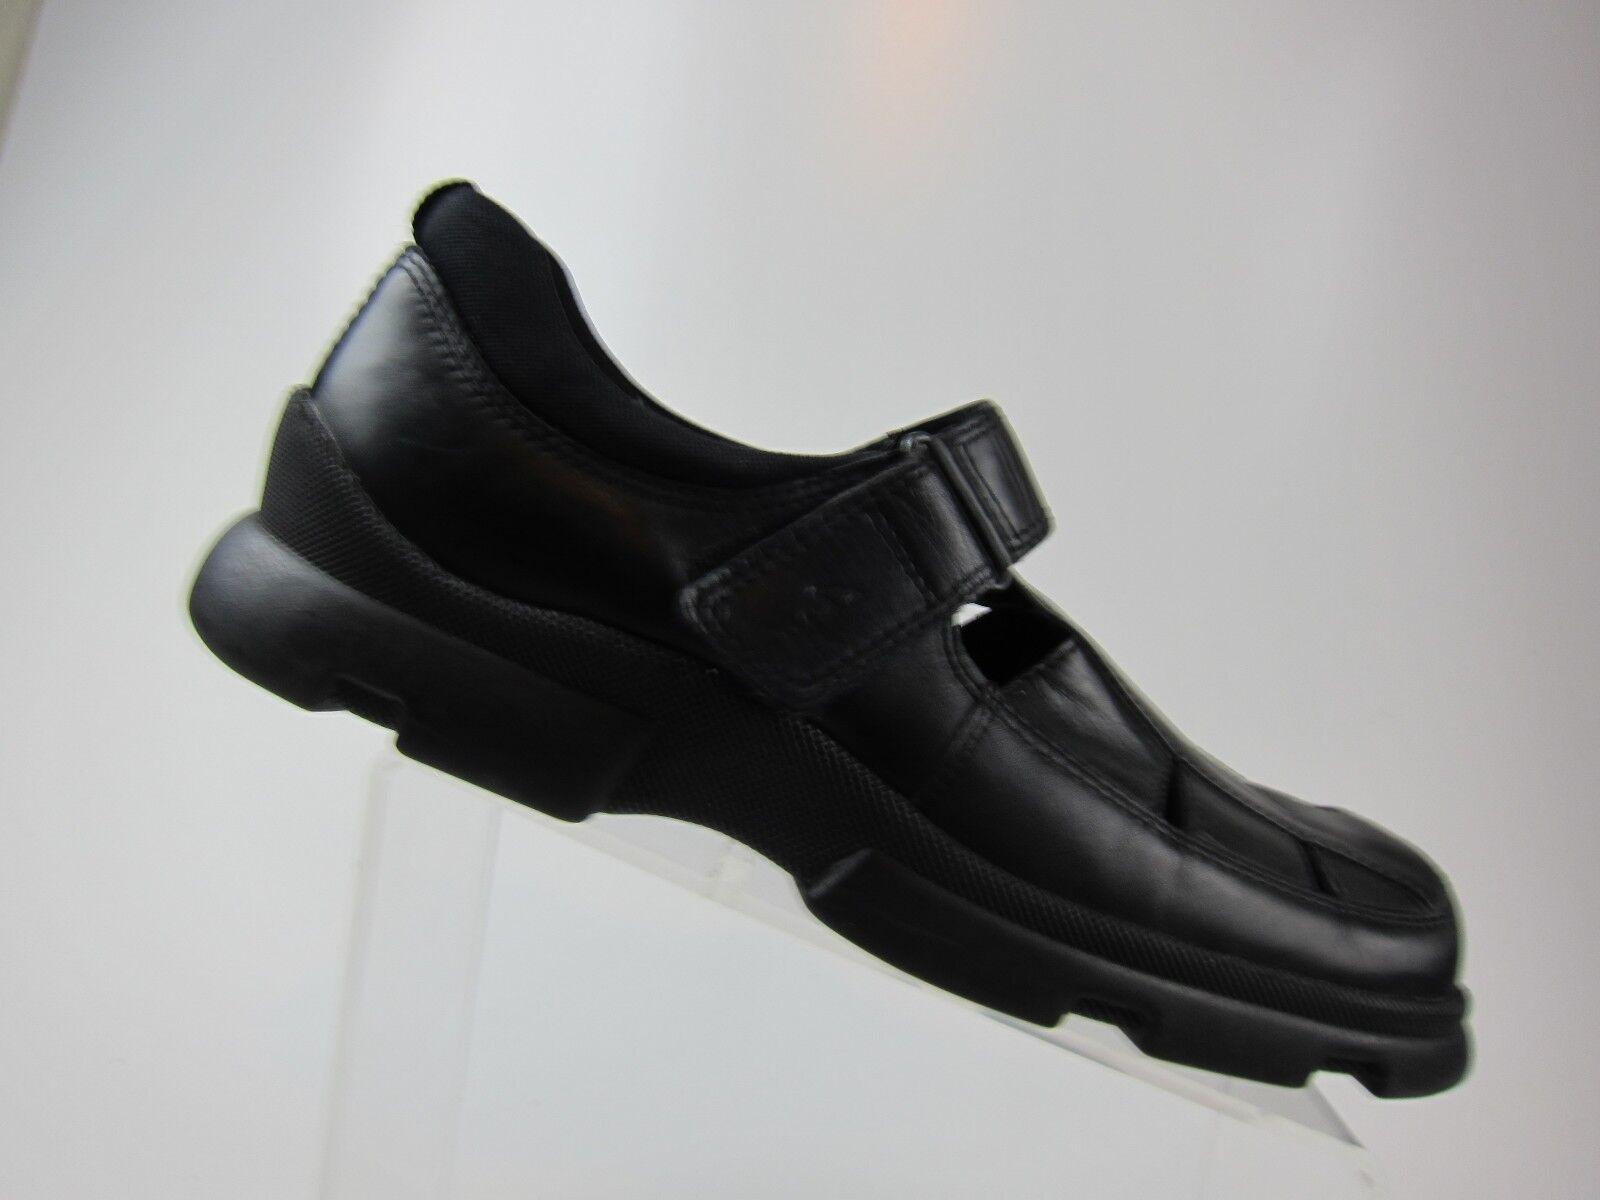 ECCO Men's Black Leather Dress   Casual Fisherman Sandals  US 12.5